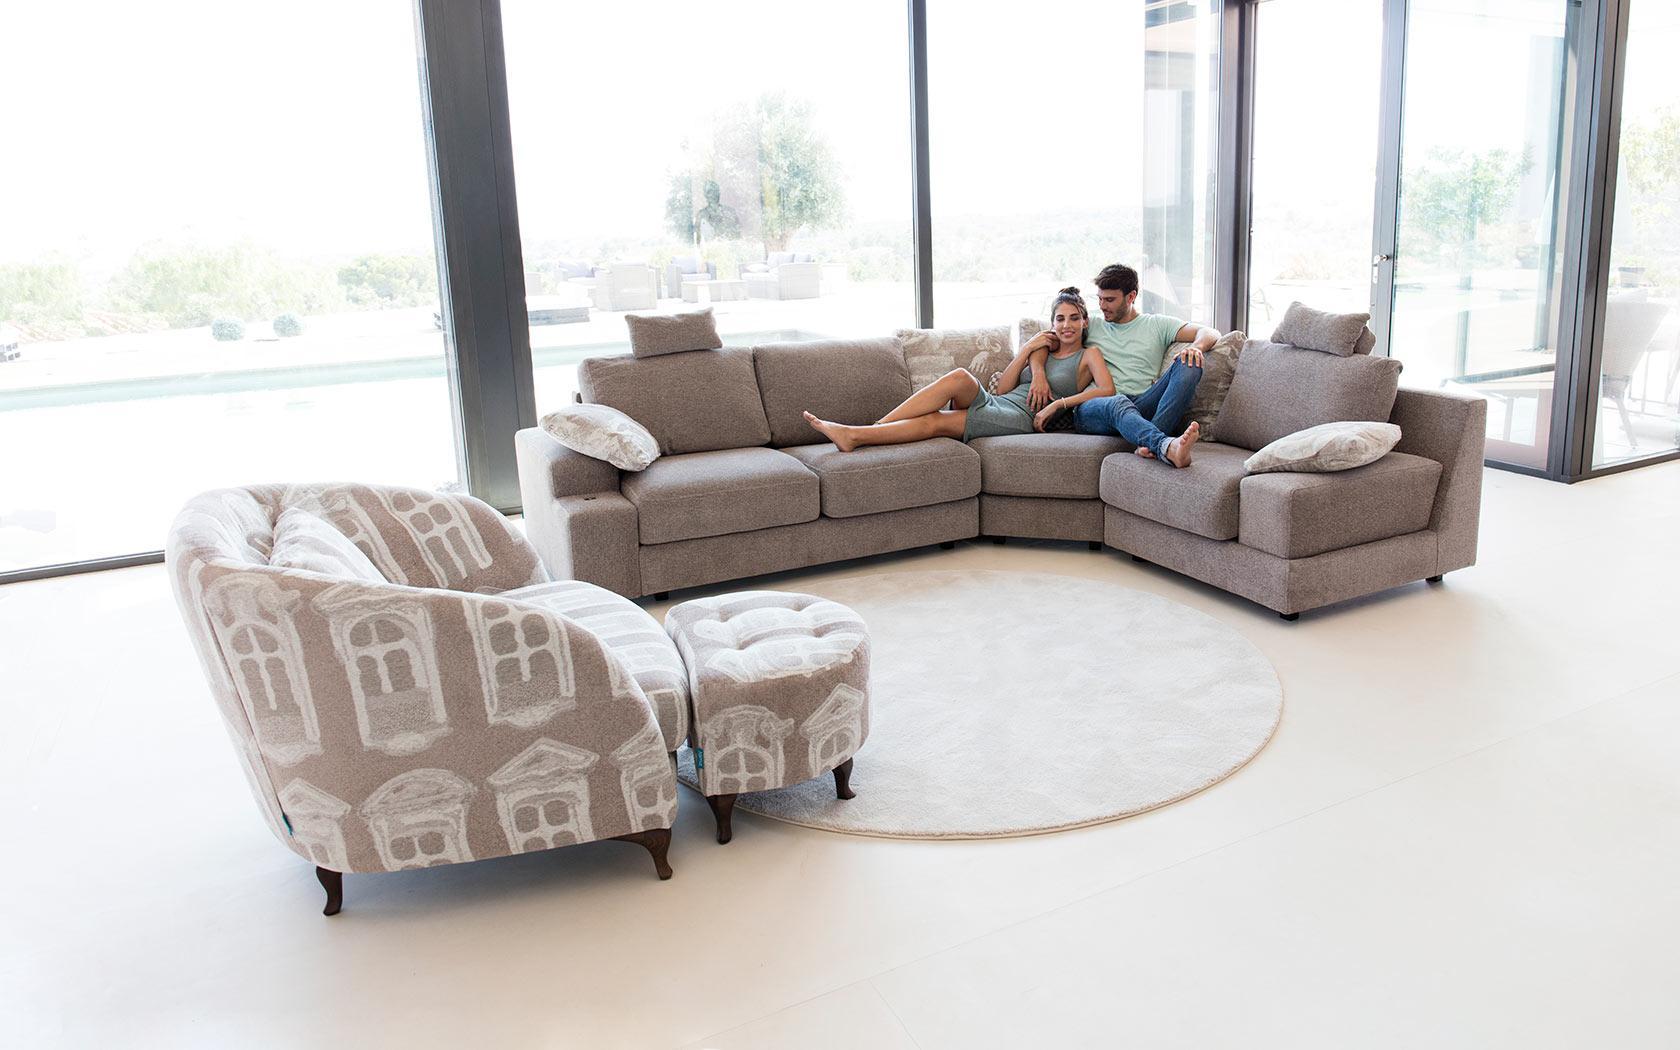 Calessi sofa Fama 2019 04